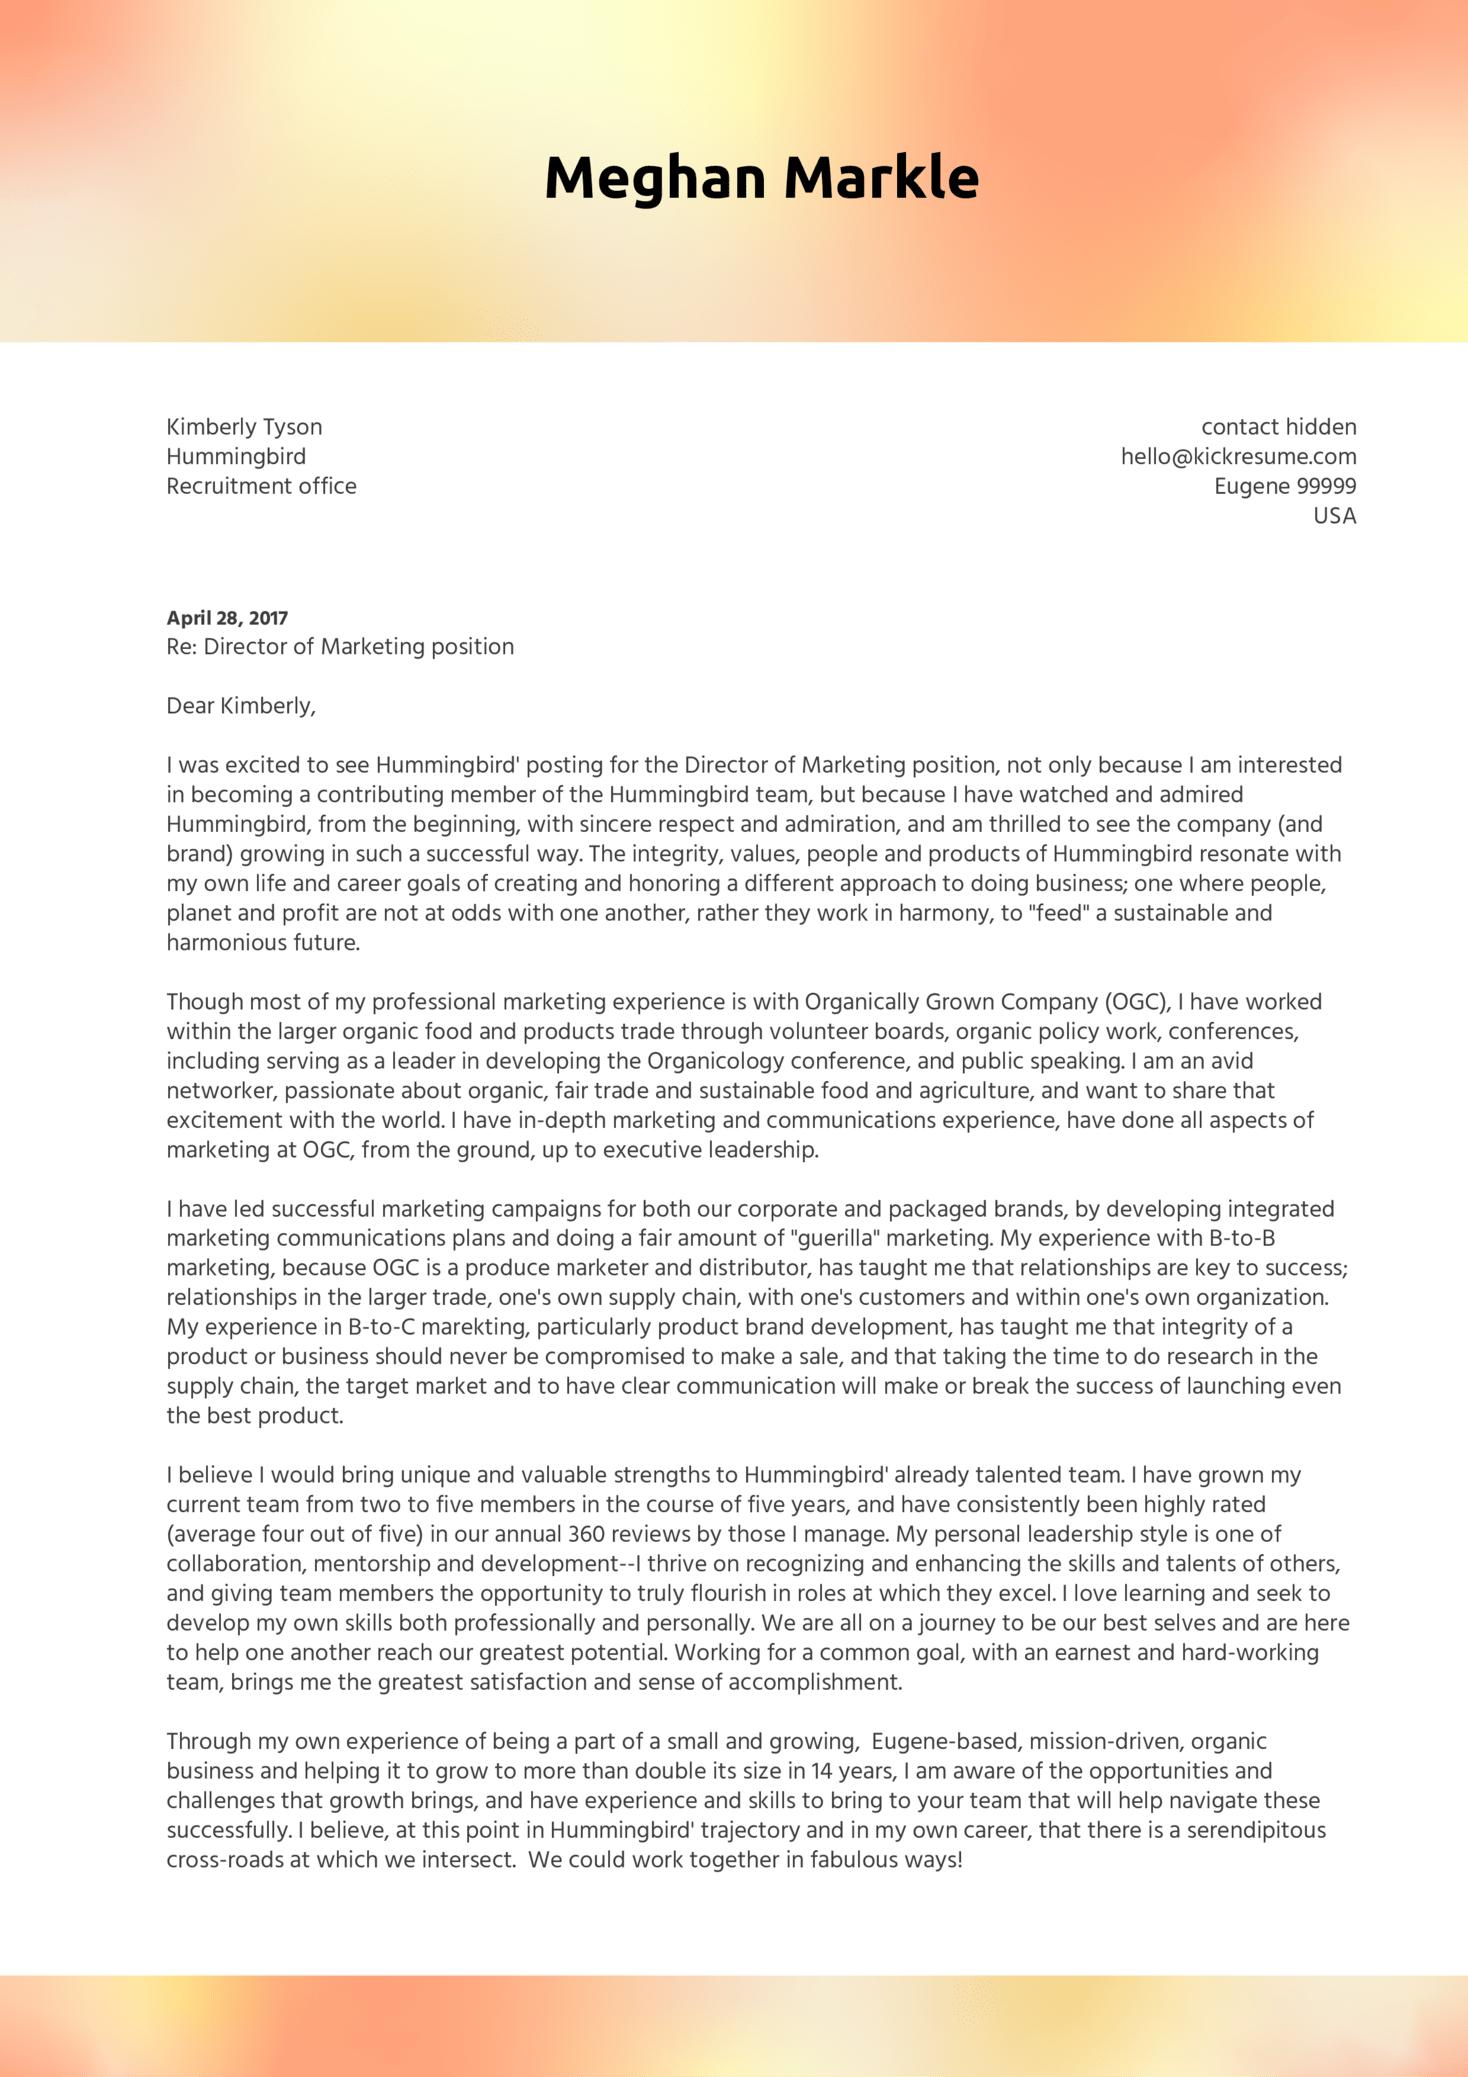 Marketing Director Cover Letter Sample (Teil 1)